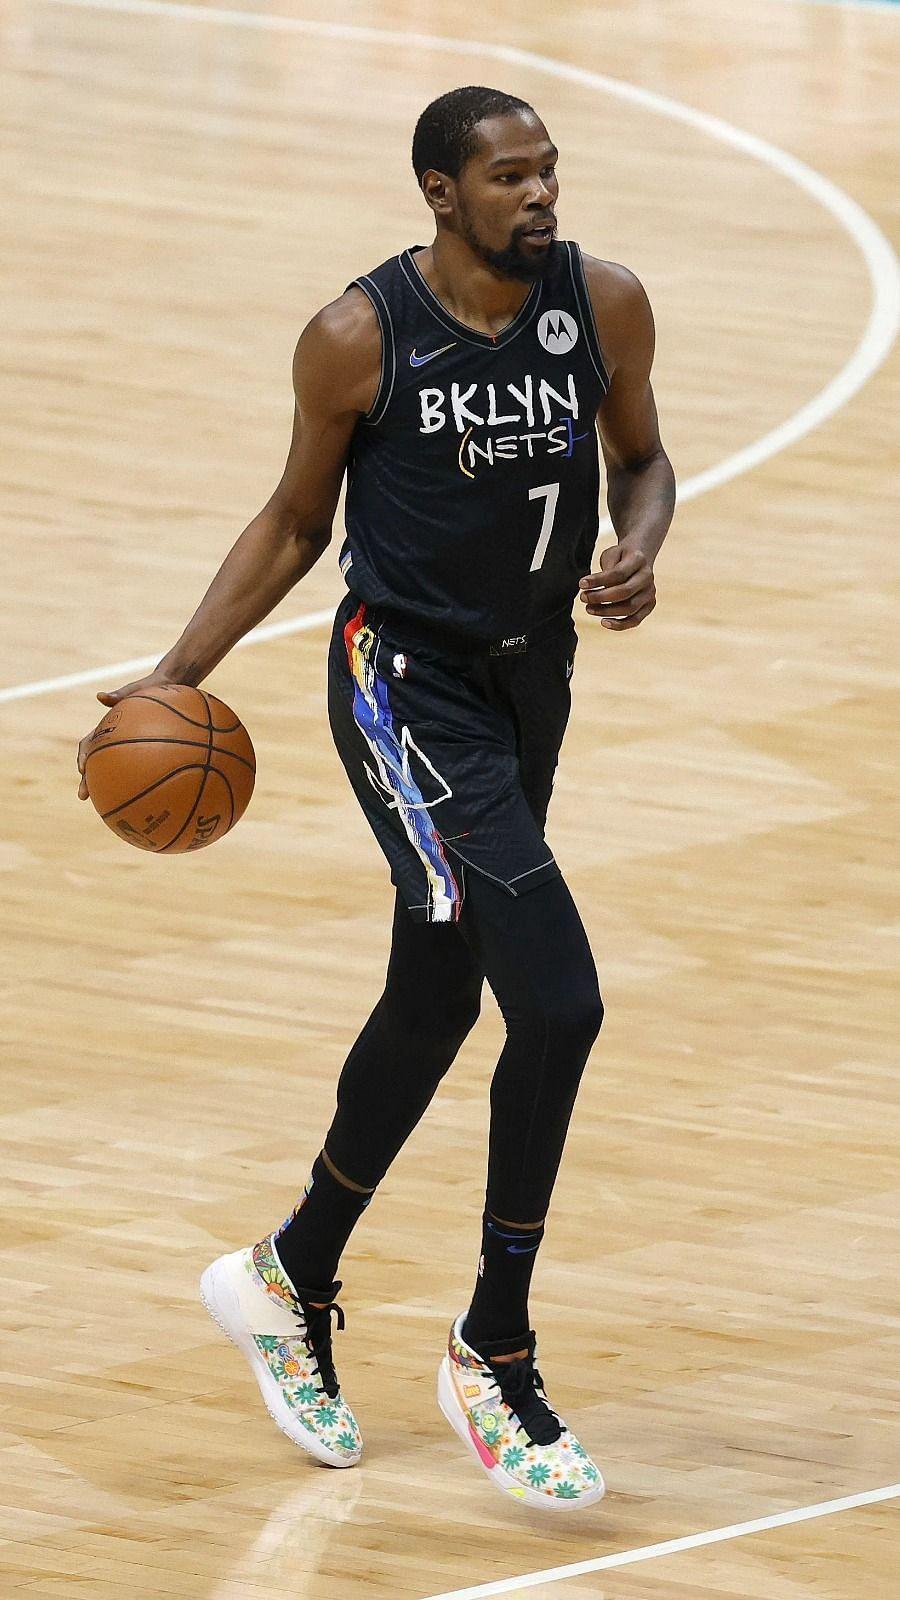 Utah Jazz Vs Brooklyn Nets Injury Updates Predicted Lineups And Starting 5 January 6th 2021 Nba Season 2020 21